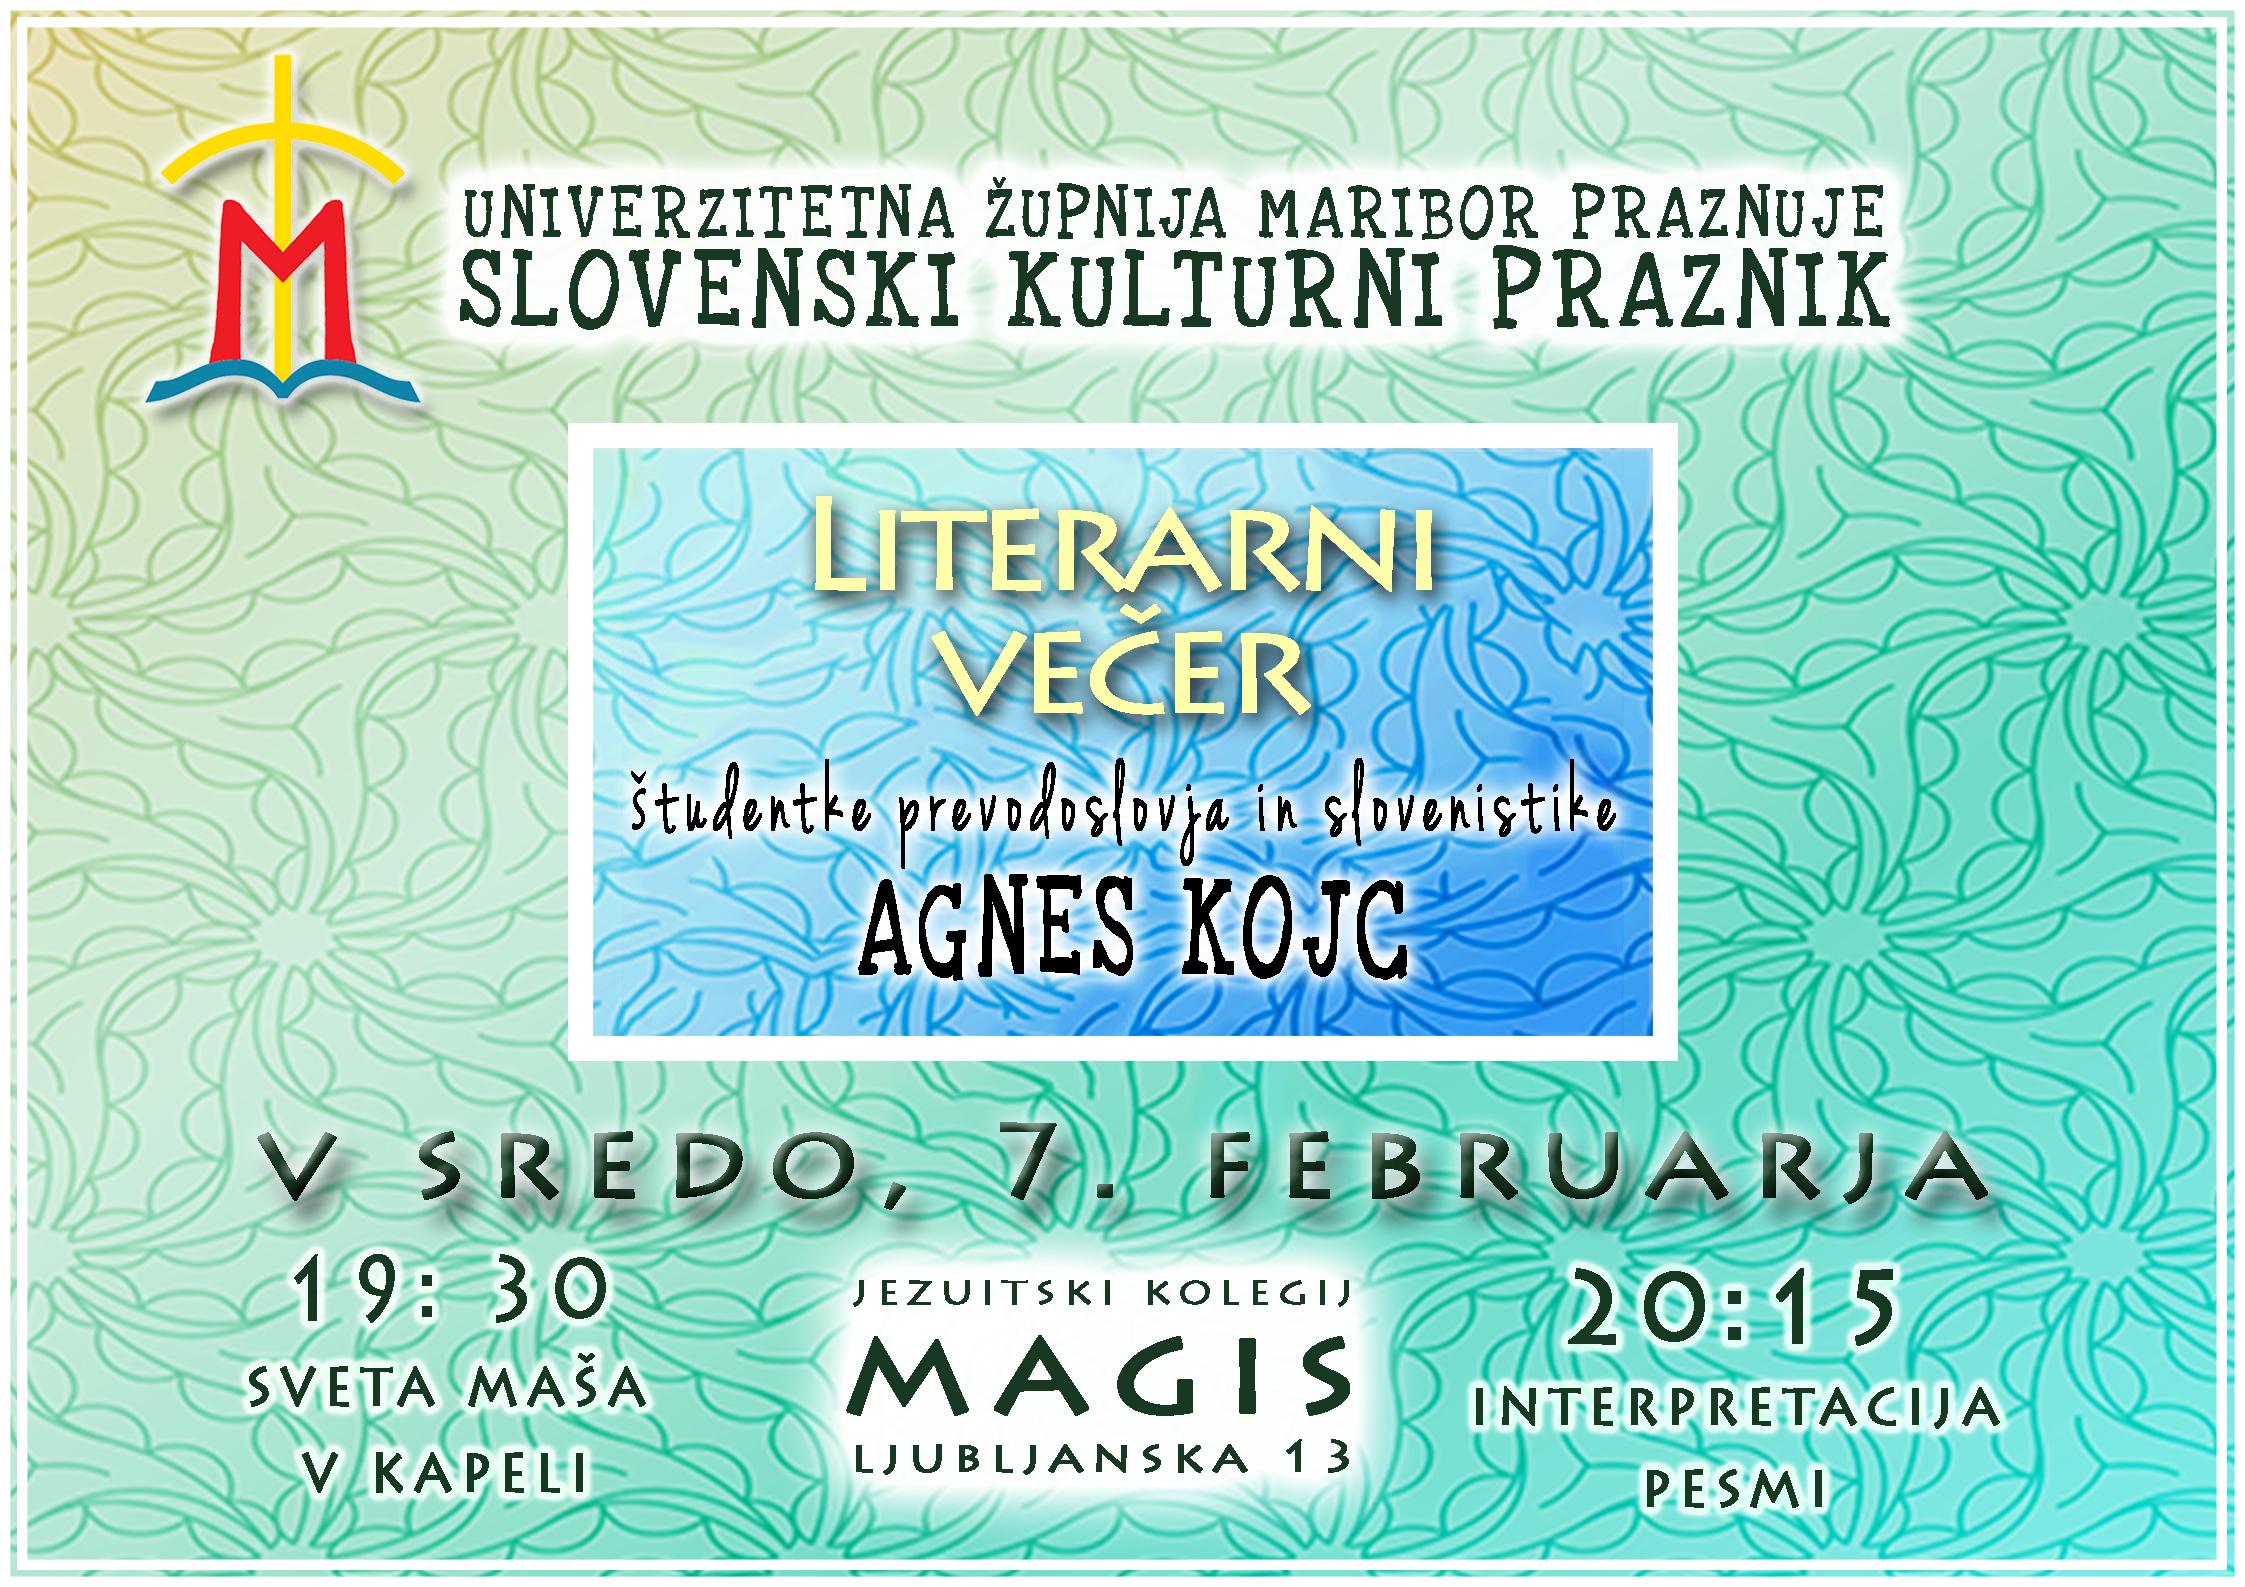 Kulturni praznik v UNIZUP Maribor